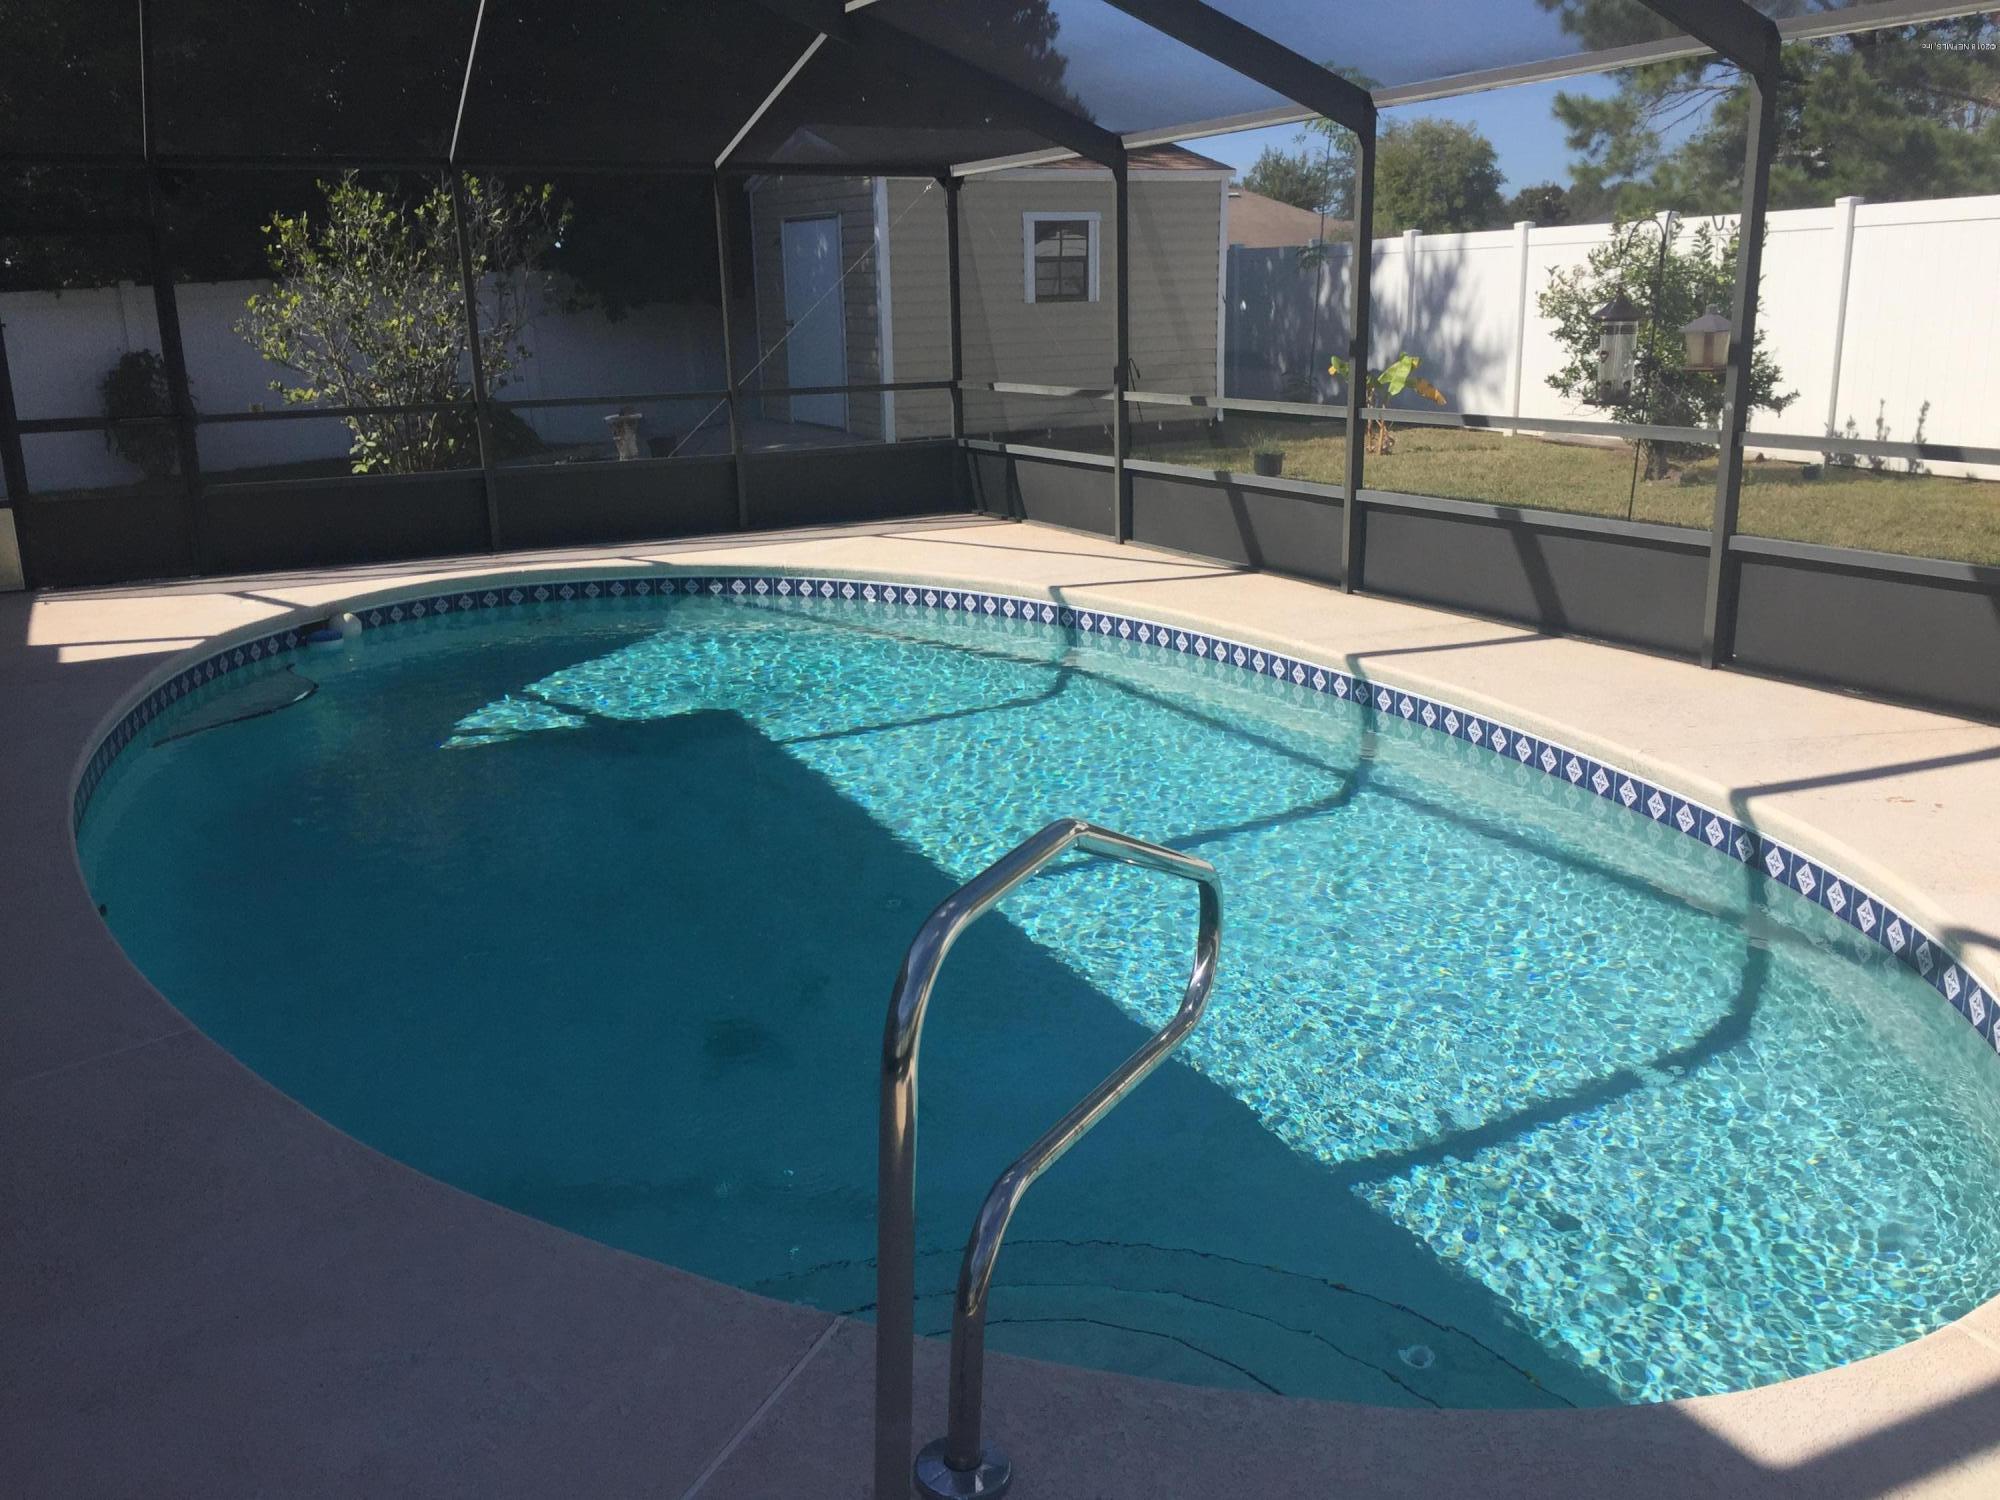 4032 SAVANNAH GLEN, ORANGE PARK, FLORIDA 32073, 3 Bedrooms Bedrooms, ,2 BathroomsBathrooms,Residential - single family,For sale,SAVANNAH GLEN,965111